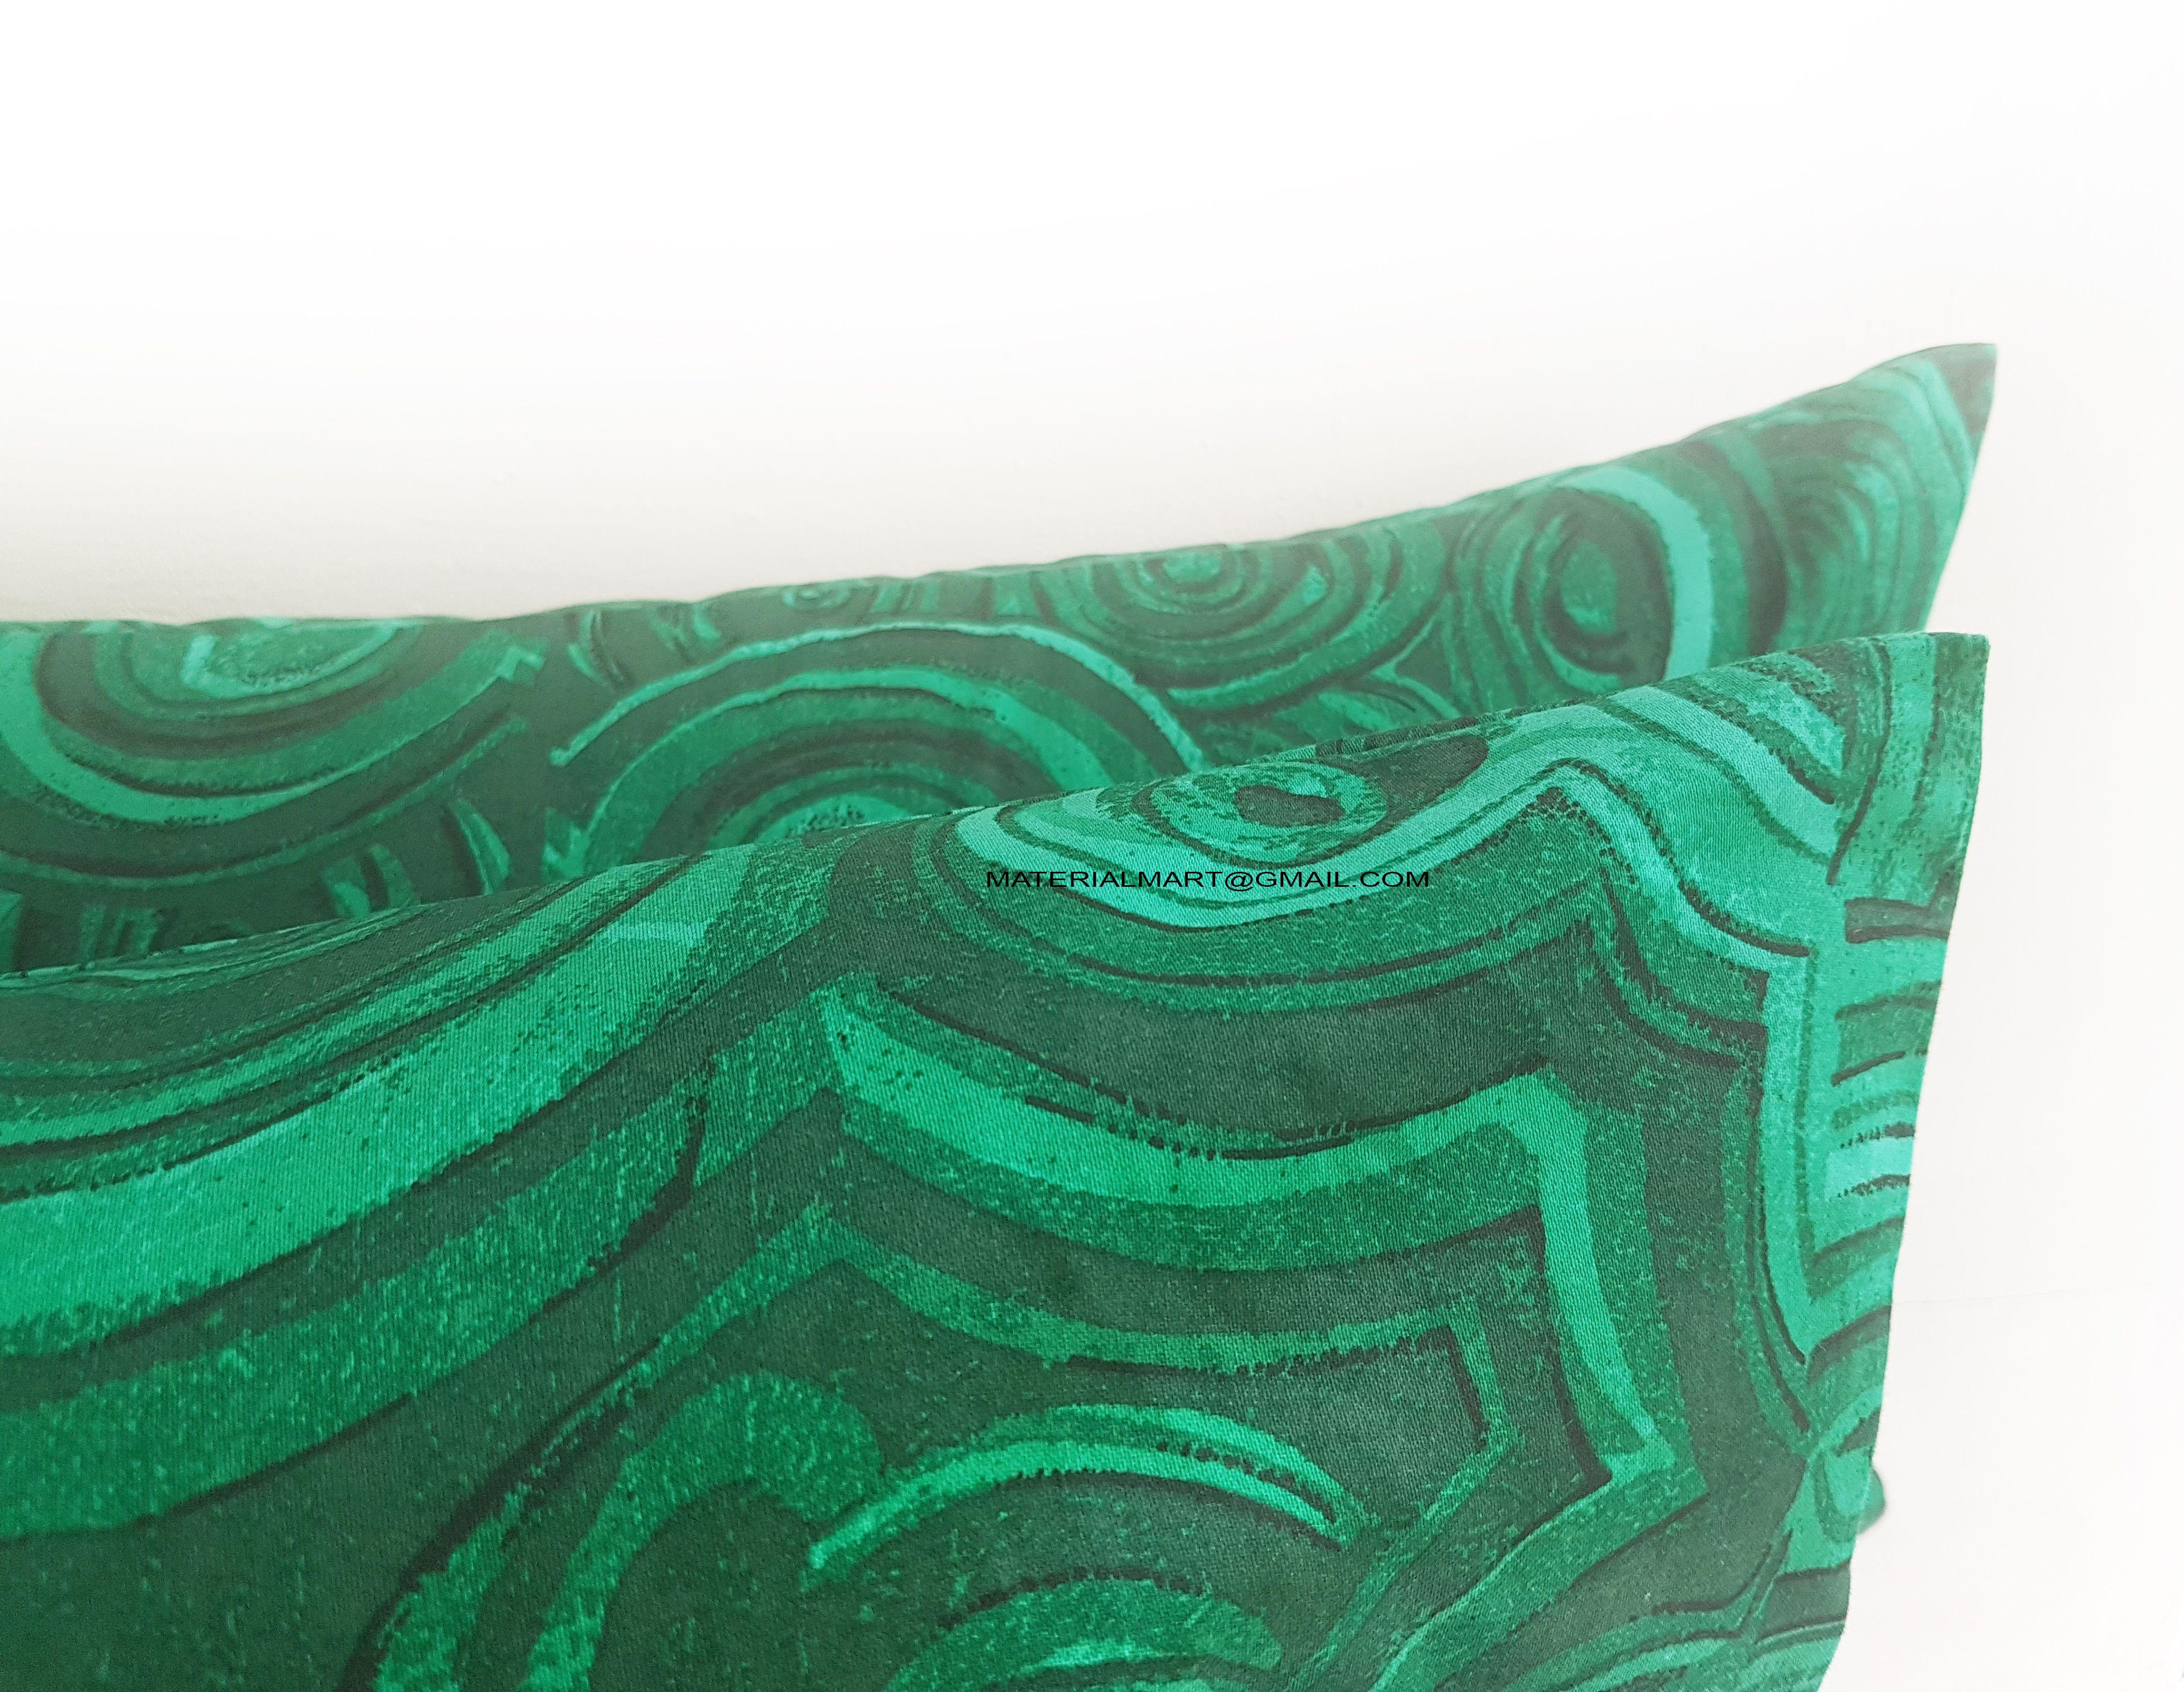 Pair of Gemstone Pillow Cover - Green Pillow Case - Invisible Zipper Pillow Cover - Jim Thompson - Zipper Throw Pillow